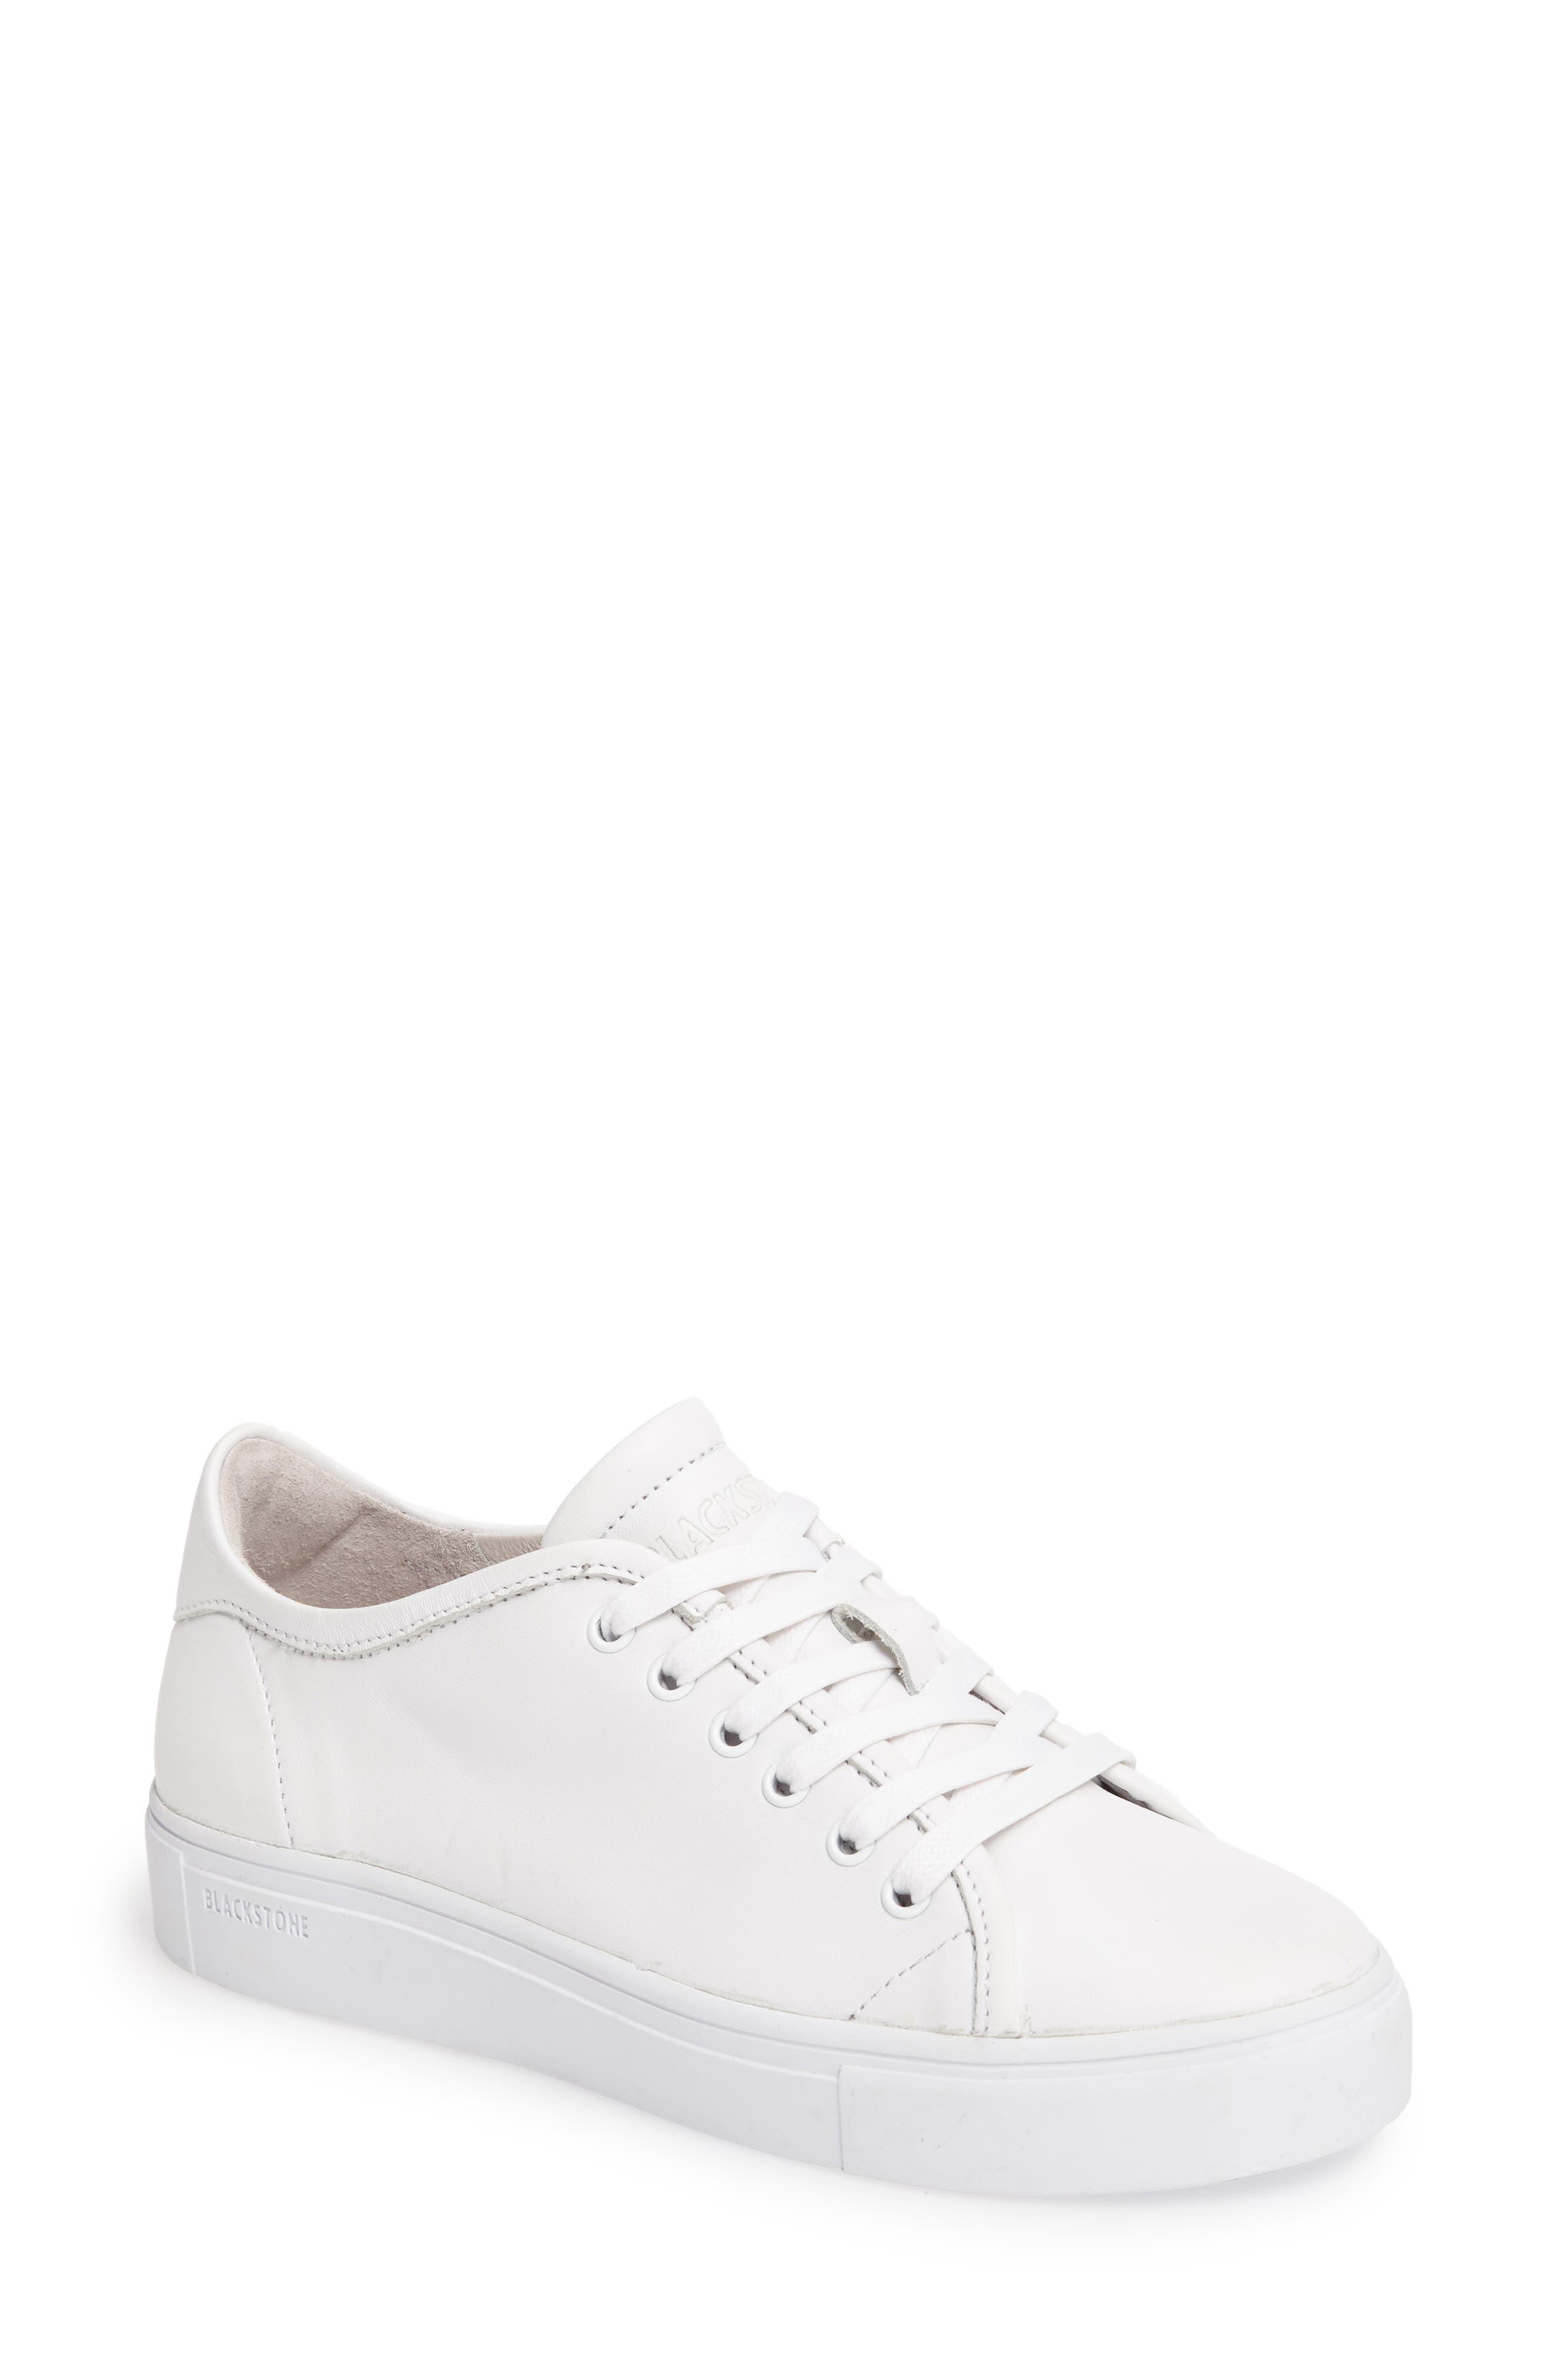 NL33 Sneaker,                             Main thumbnail 1, color,                             100